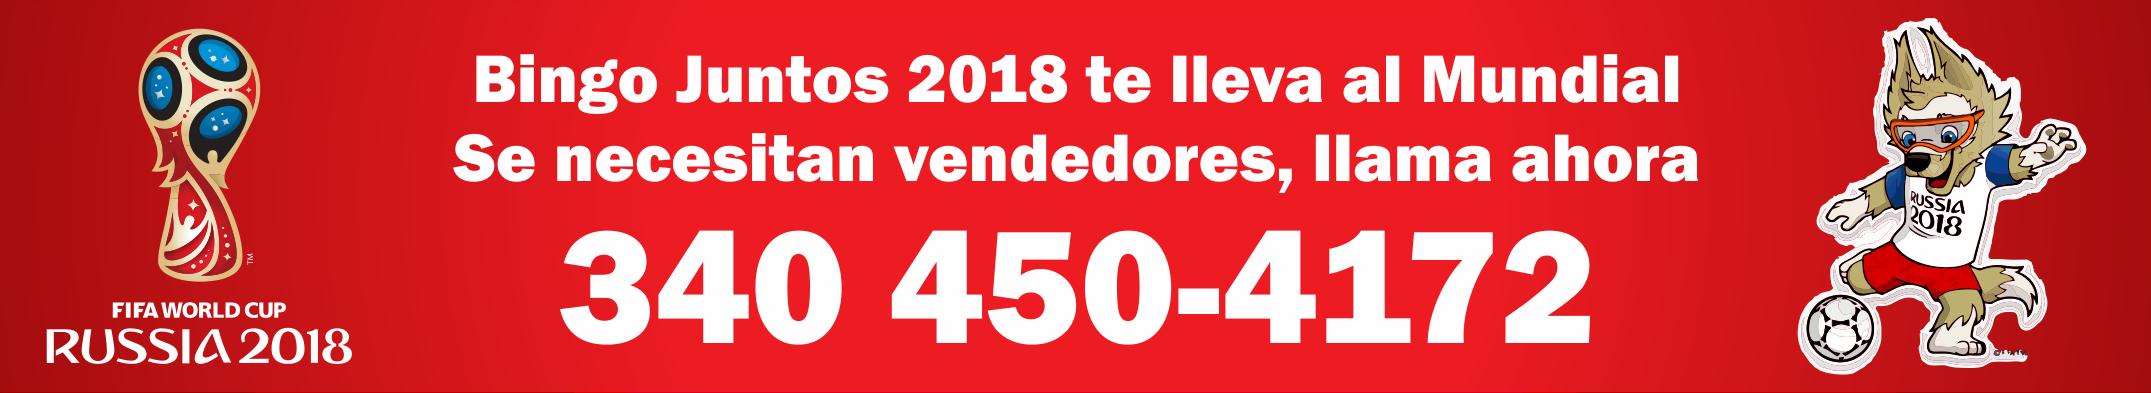 SI Bingo Rusia 2018